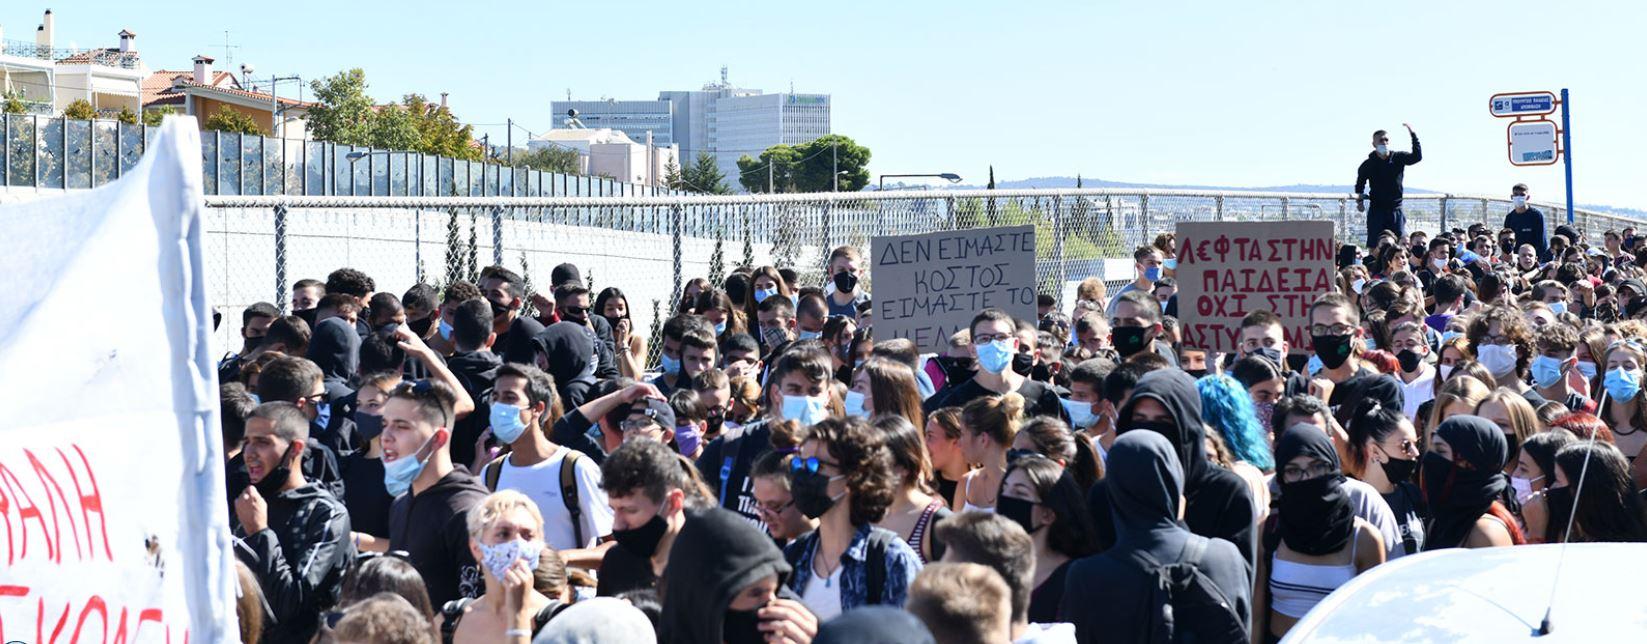 mathites kinitopoiisi Η κυβέρνηση έπνιξε με χημικά τη διαδήλωση 3